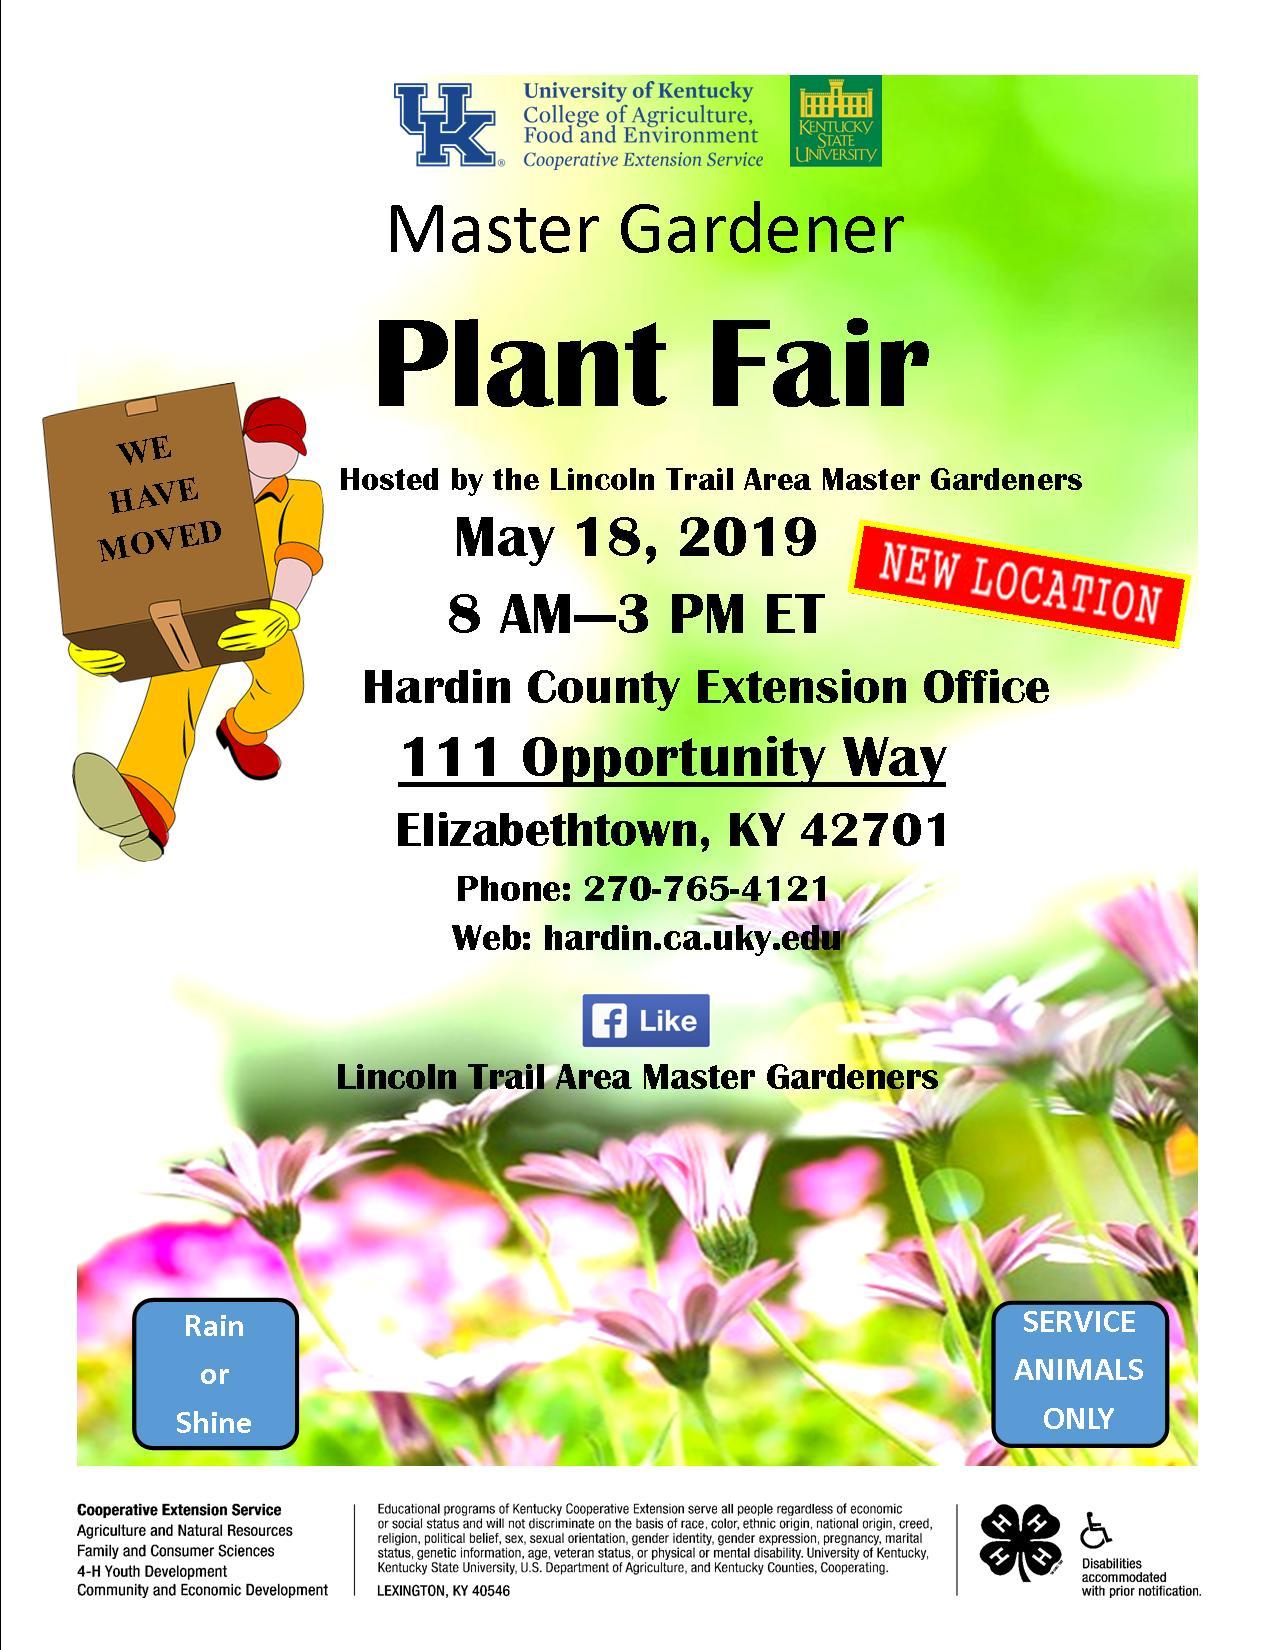 Hardin County Master Gardeners Plant Fair - Kentucky Living